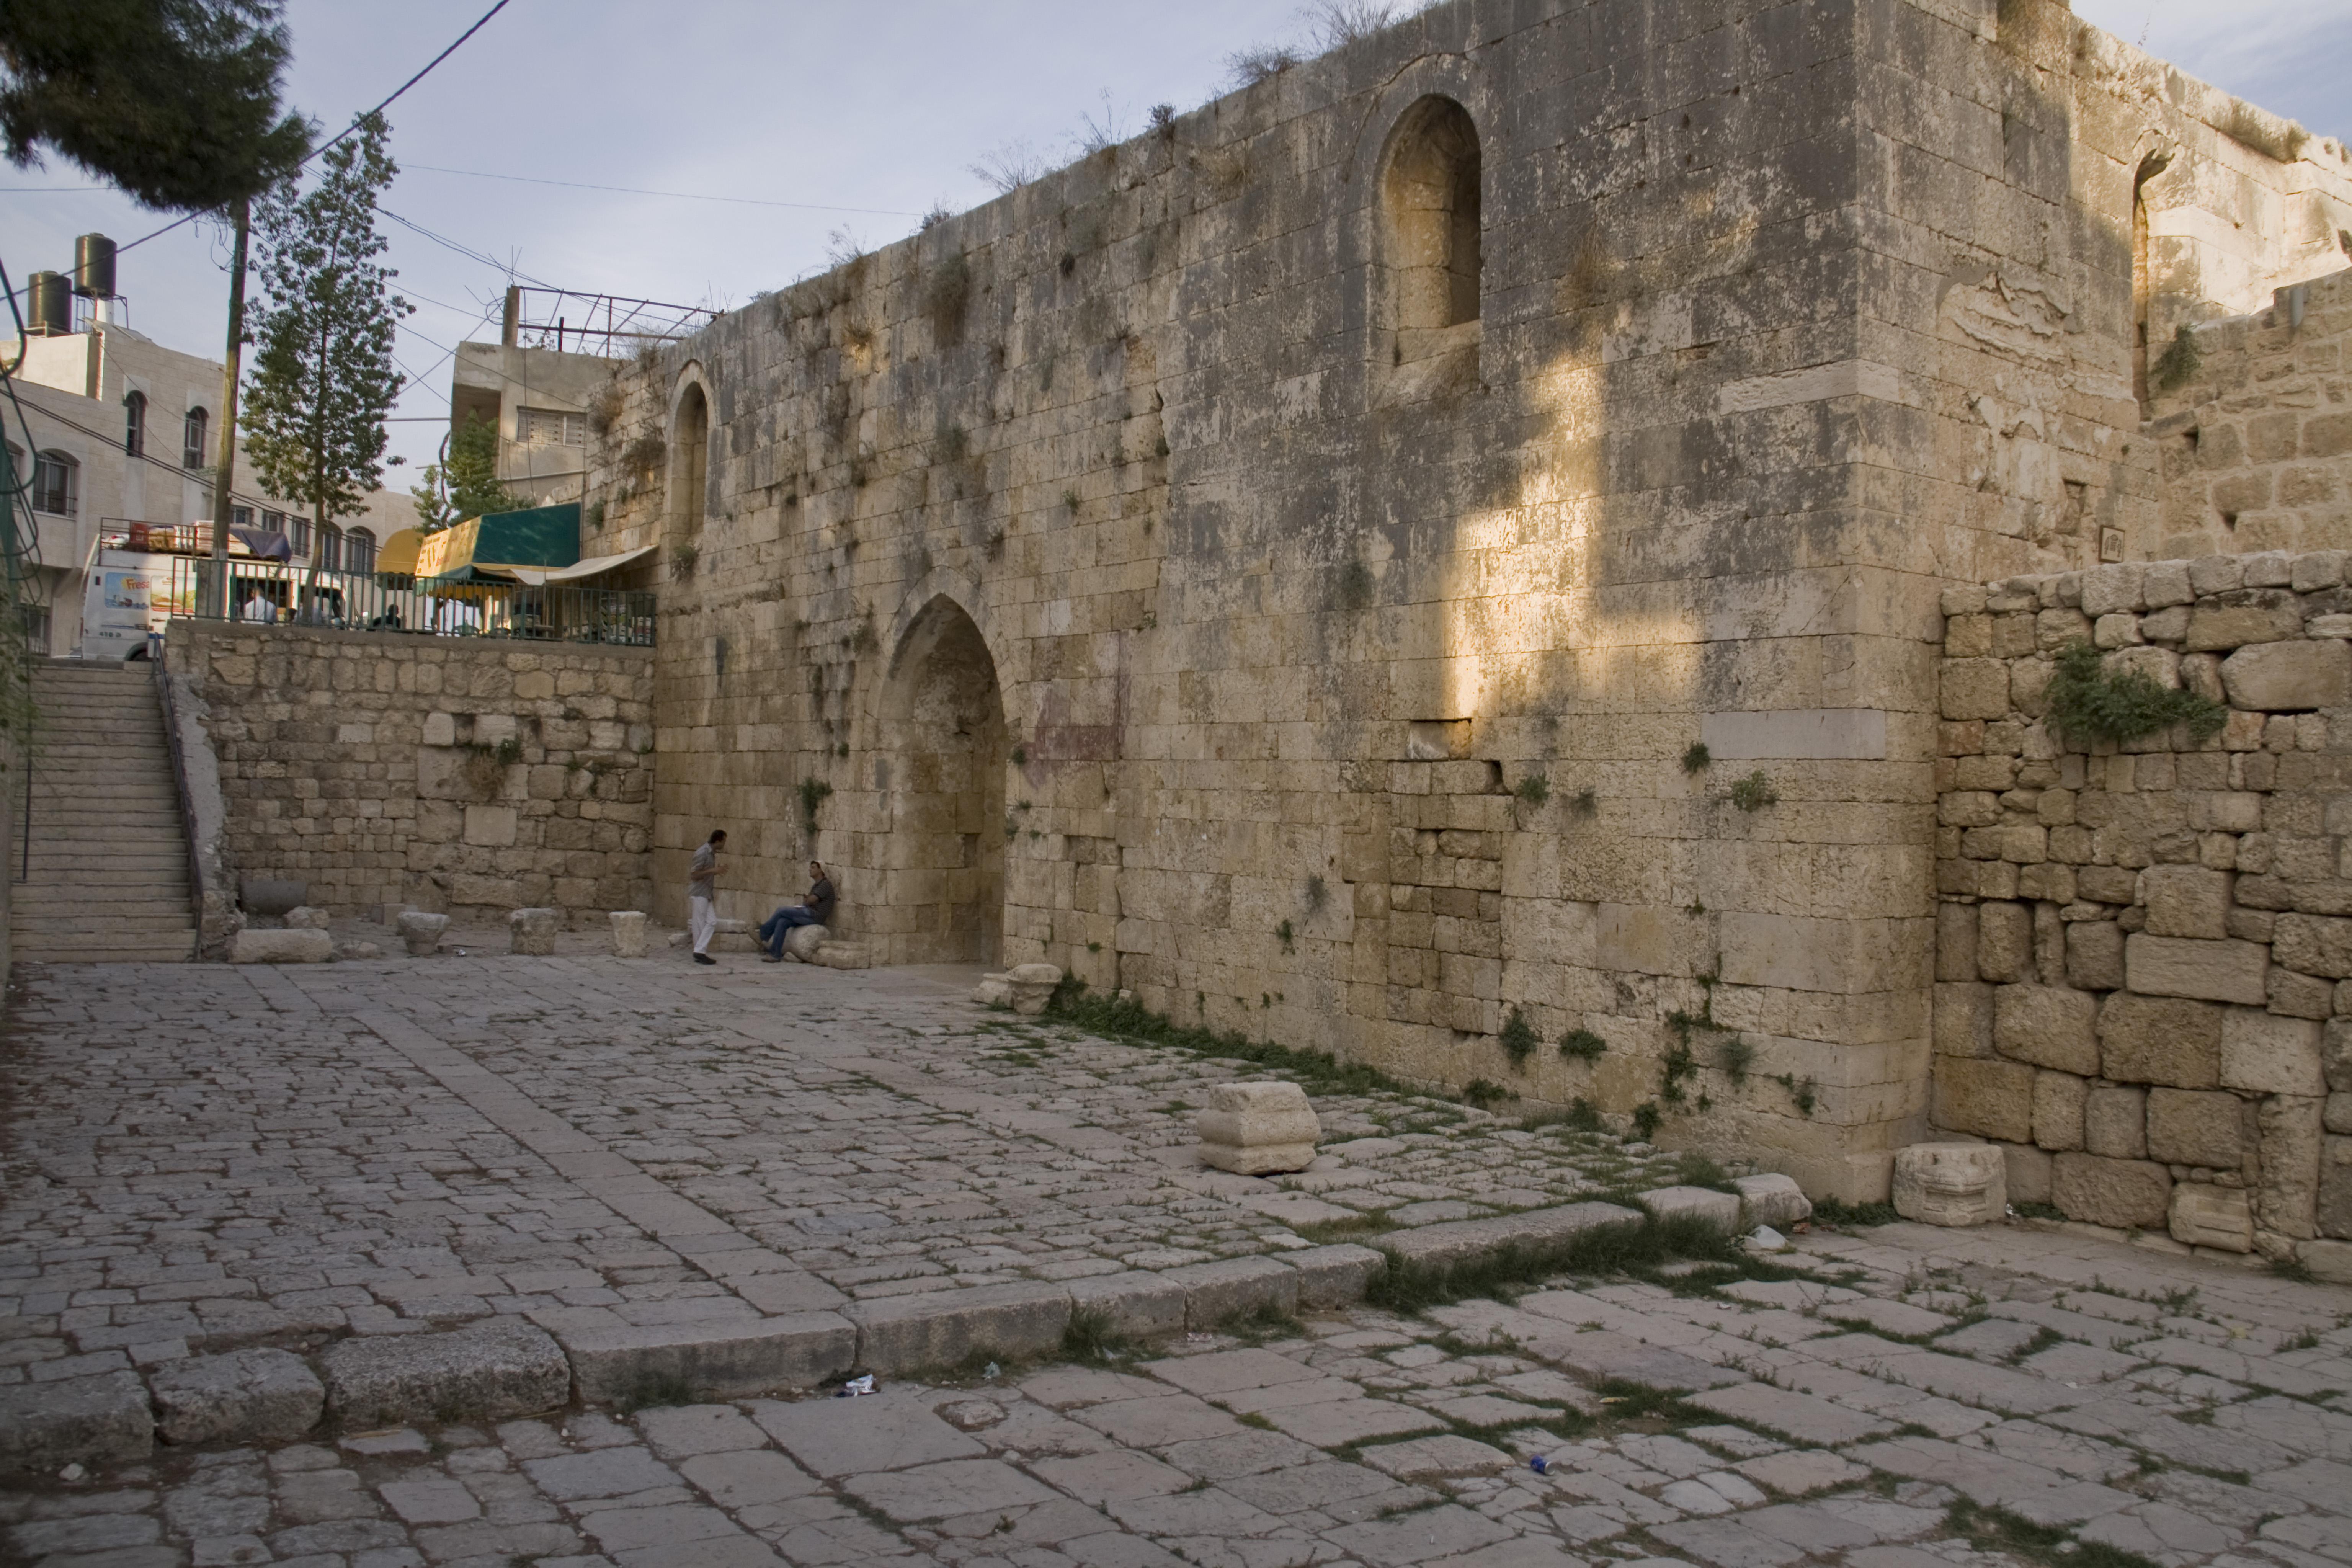 John the Baptist/Saidna Yahia